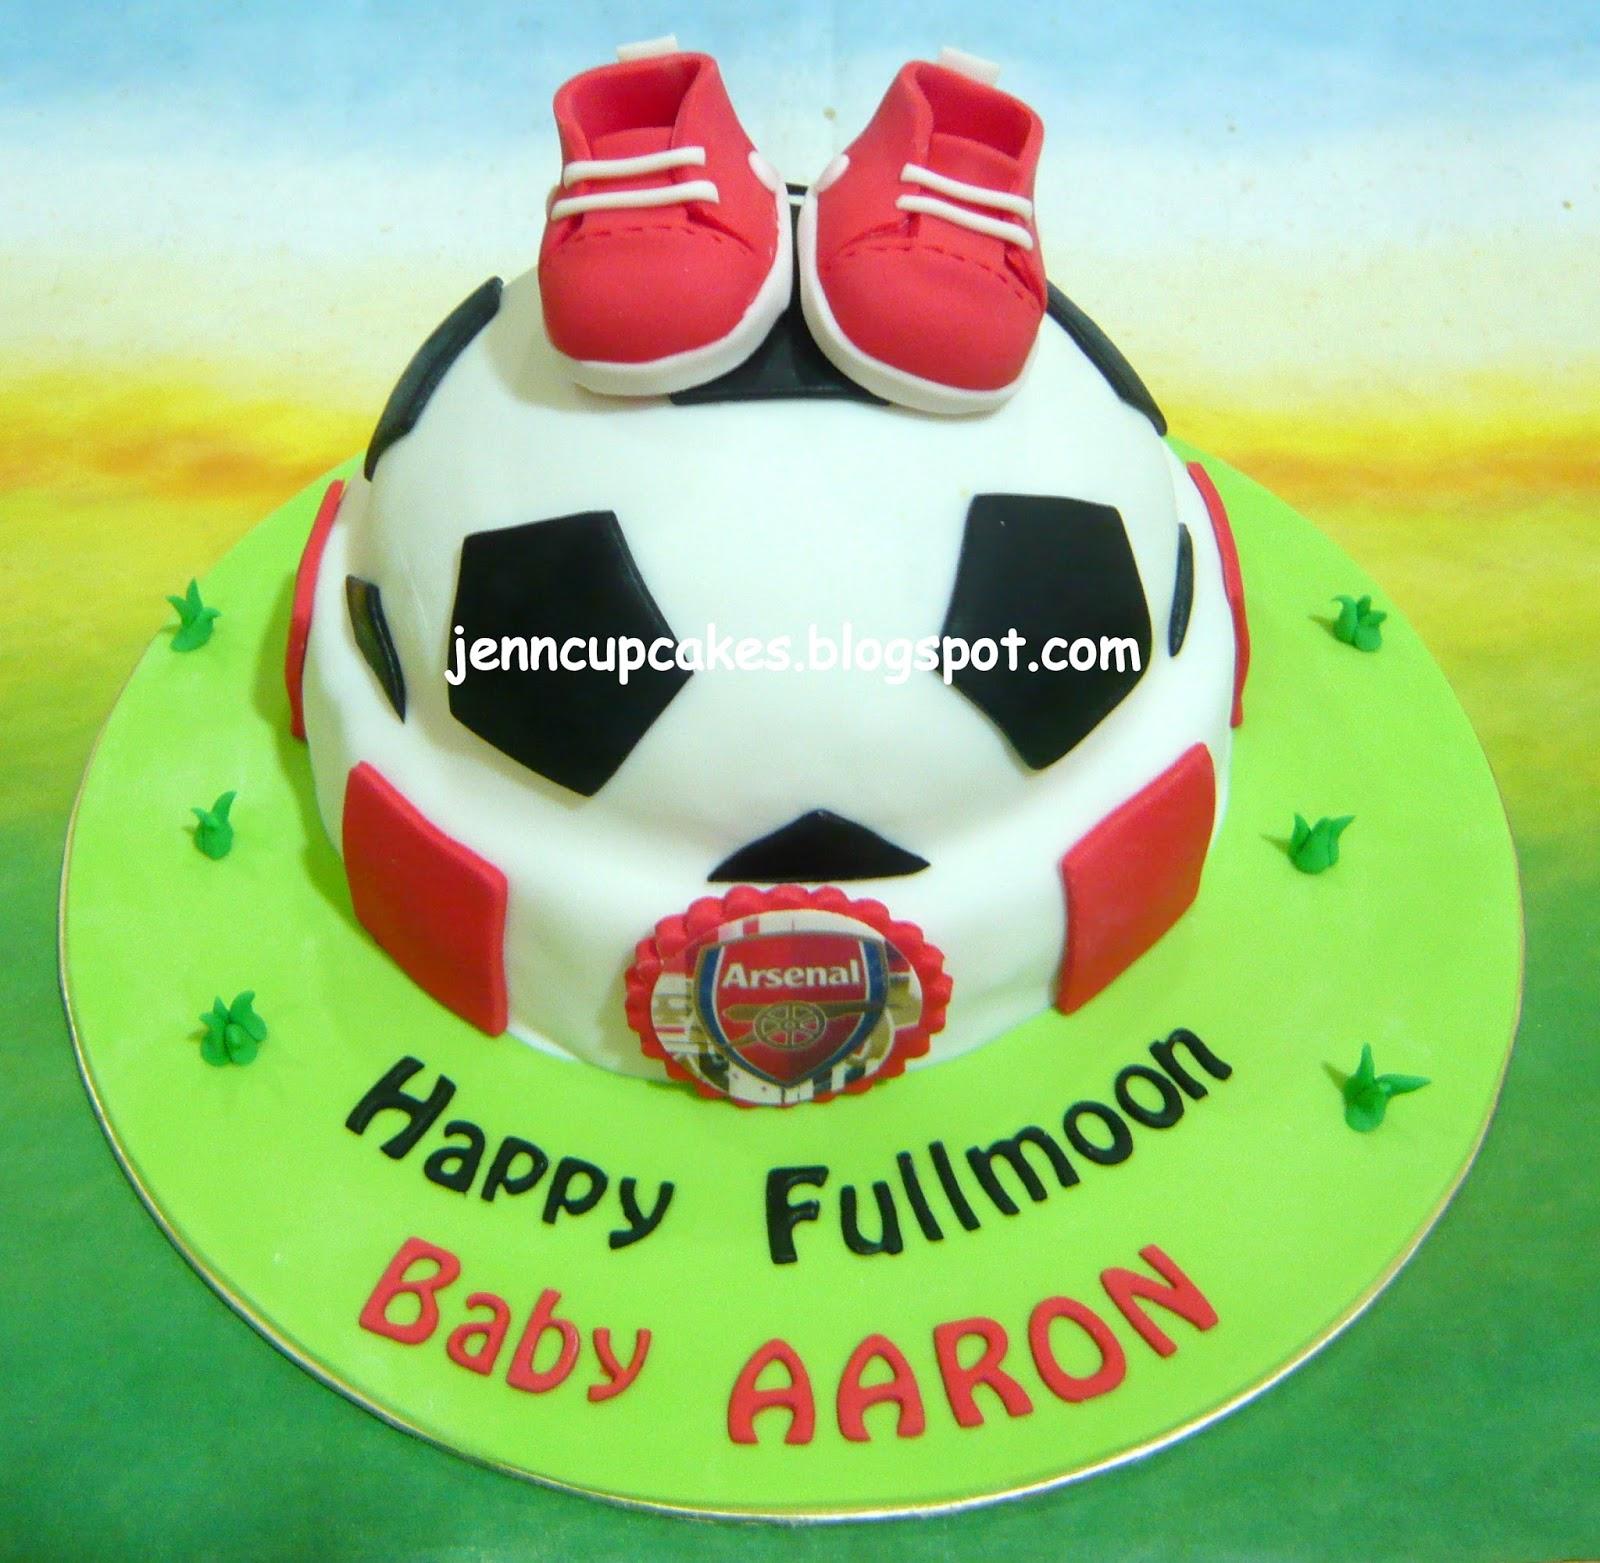 Jenn Cupcakes Muffins Arsenal Theme Fullmoon Cake